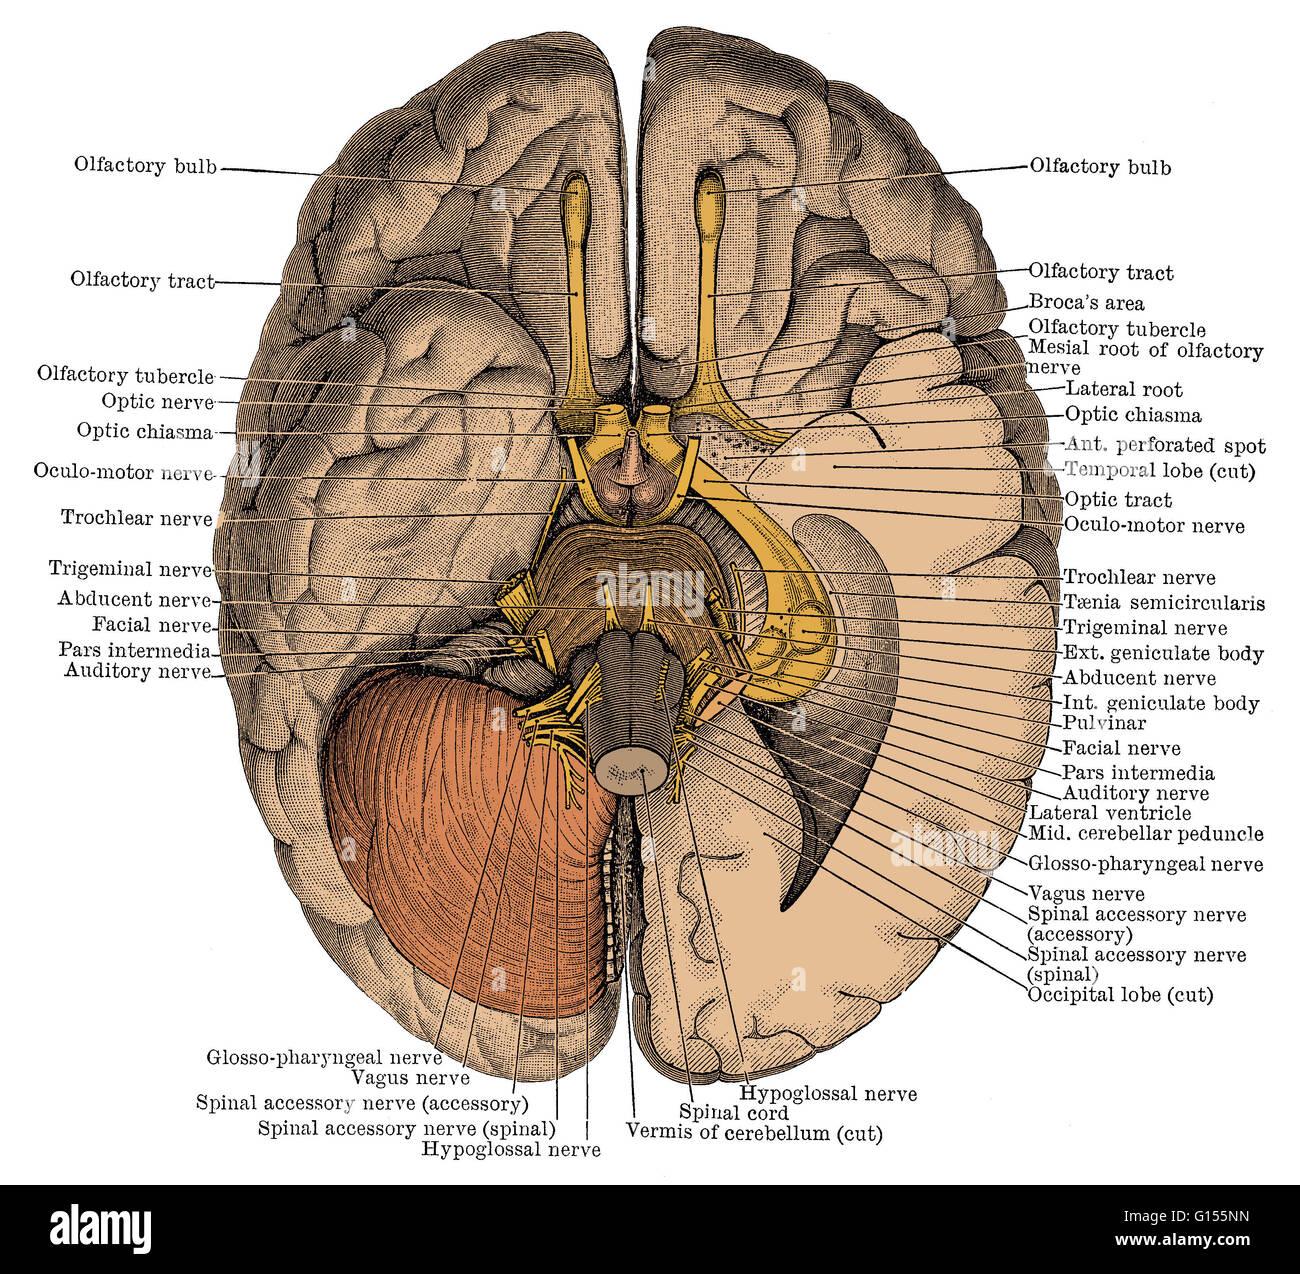 Vagus Nerve Stock Photos & Vagus Nerve Stock Images - Alamy